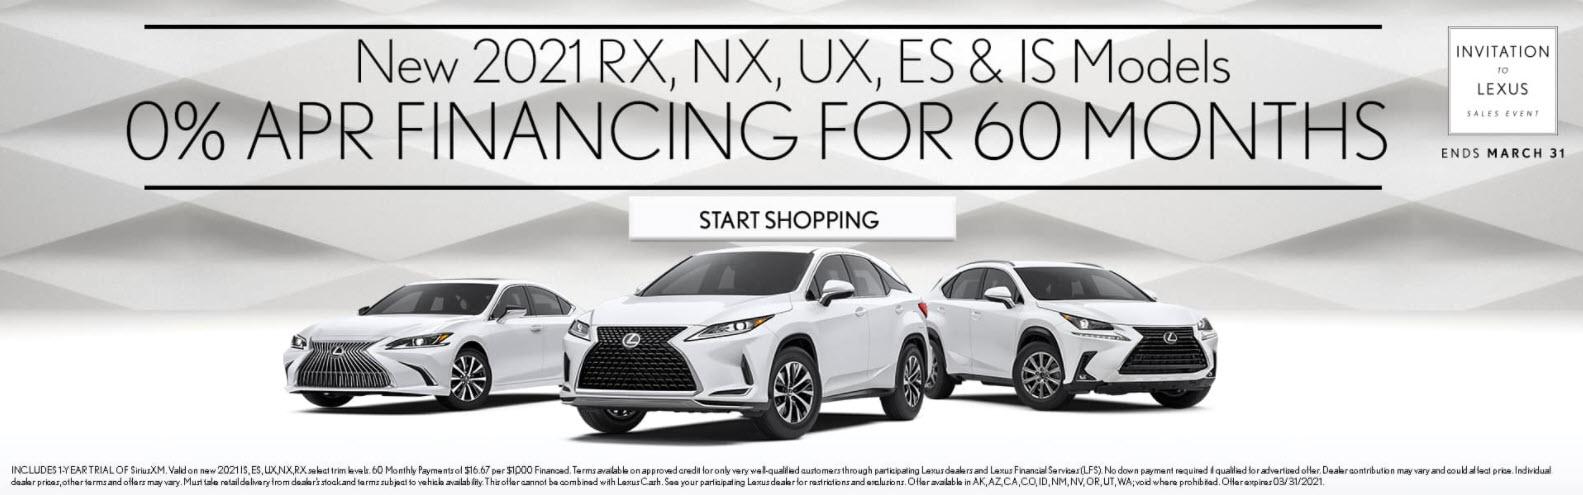 2021 RX, NX, UX, ES, & IS Models